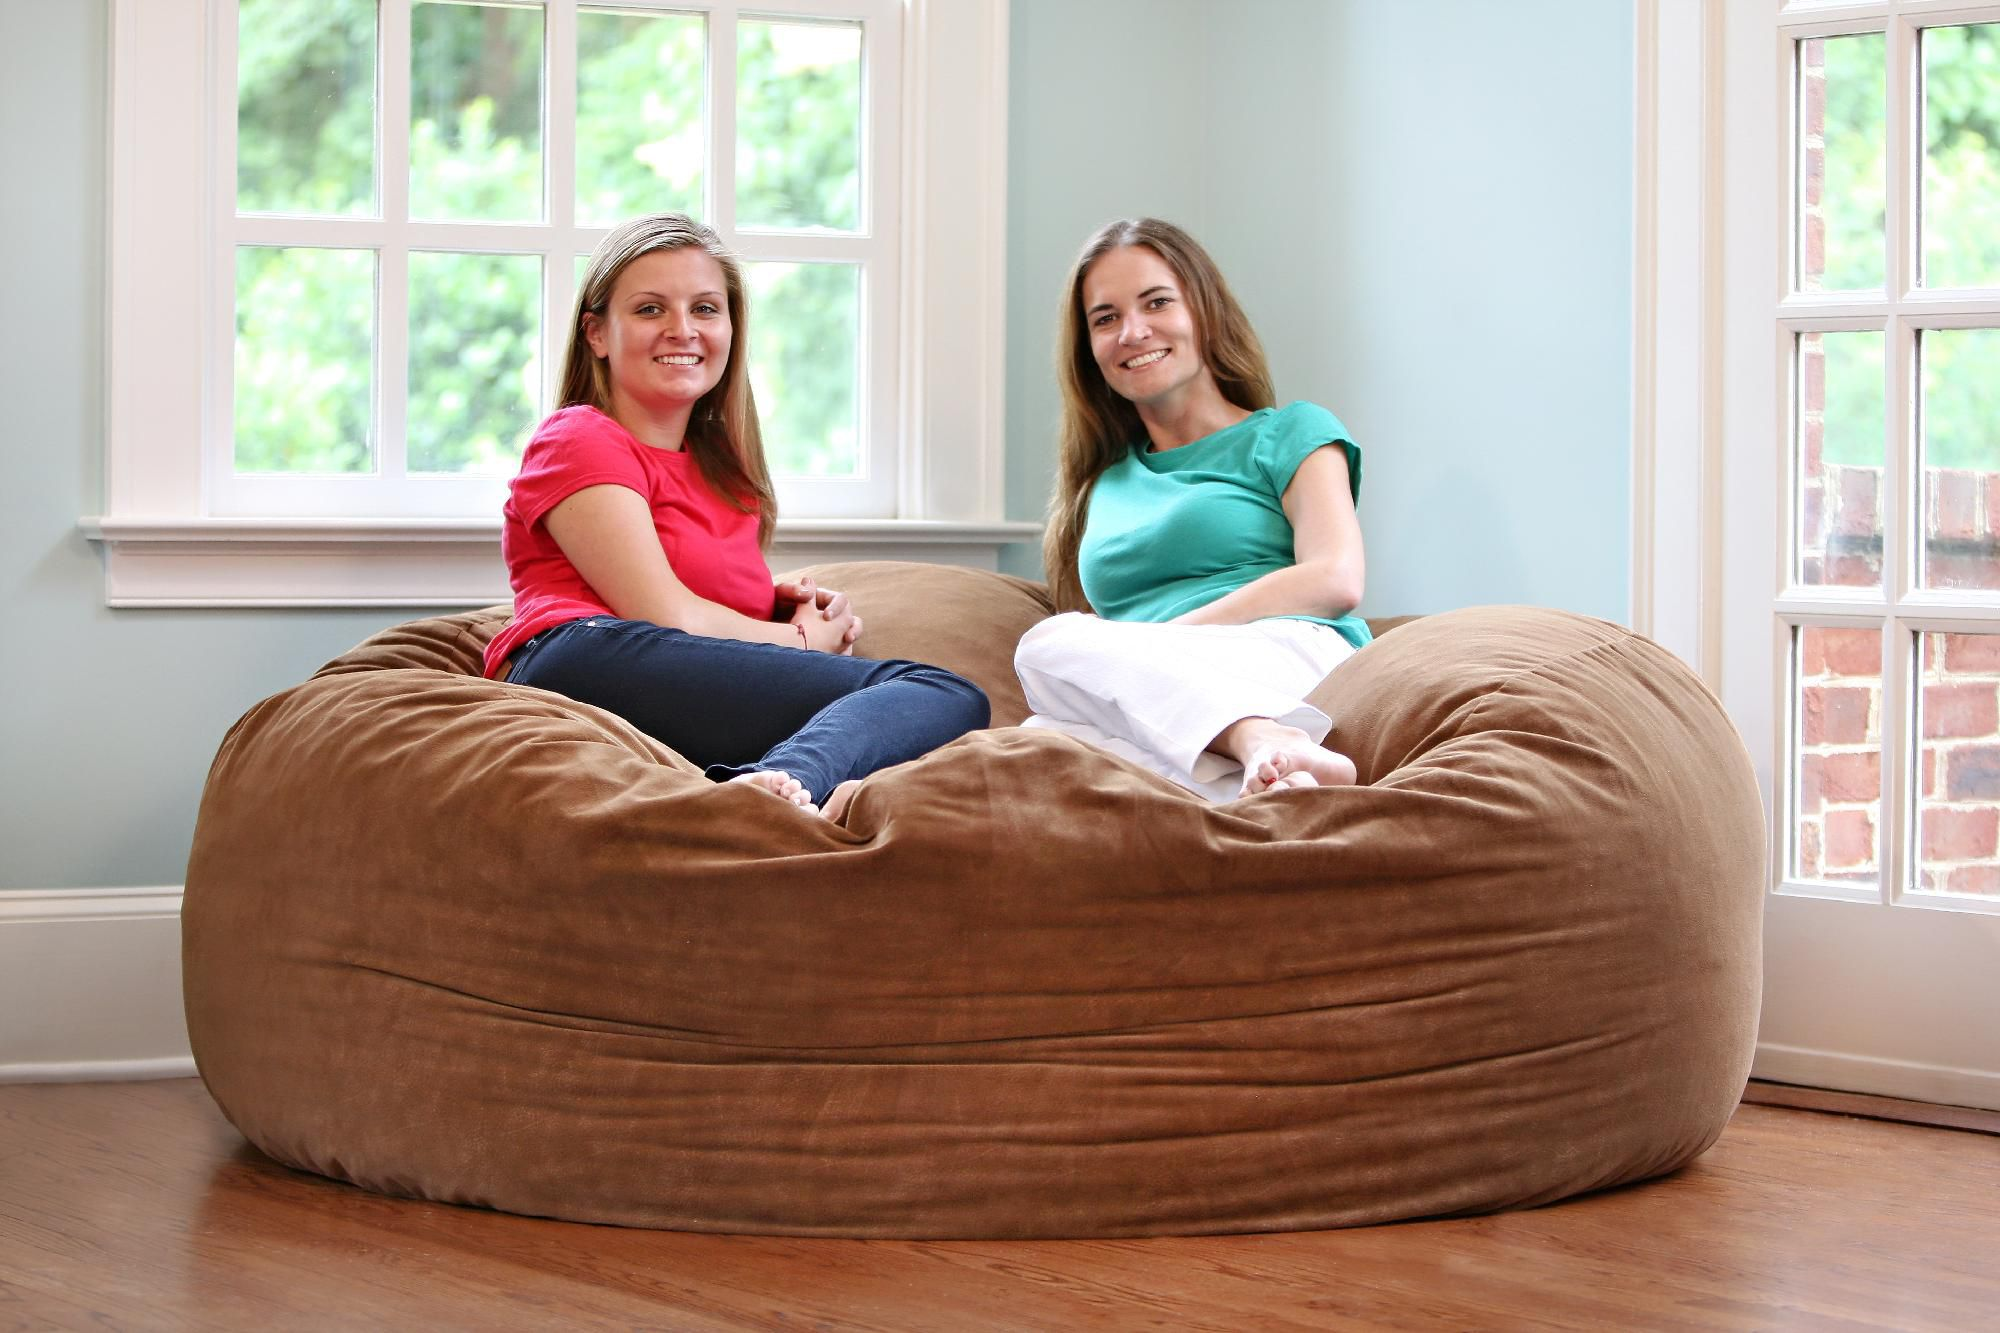 6 foot bean bag chair antique wooden desk on wheels comfort cloud foam bags